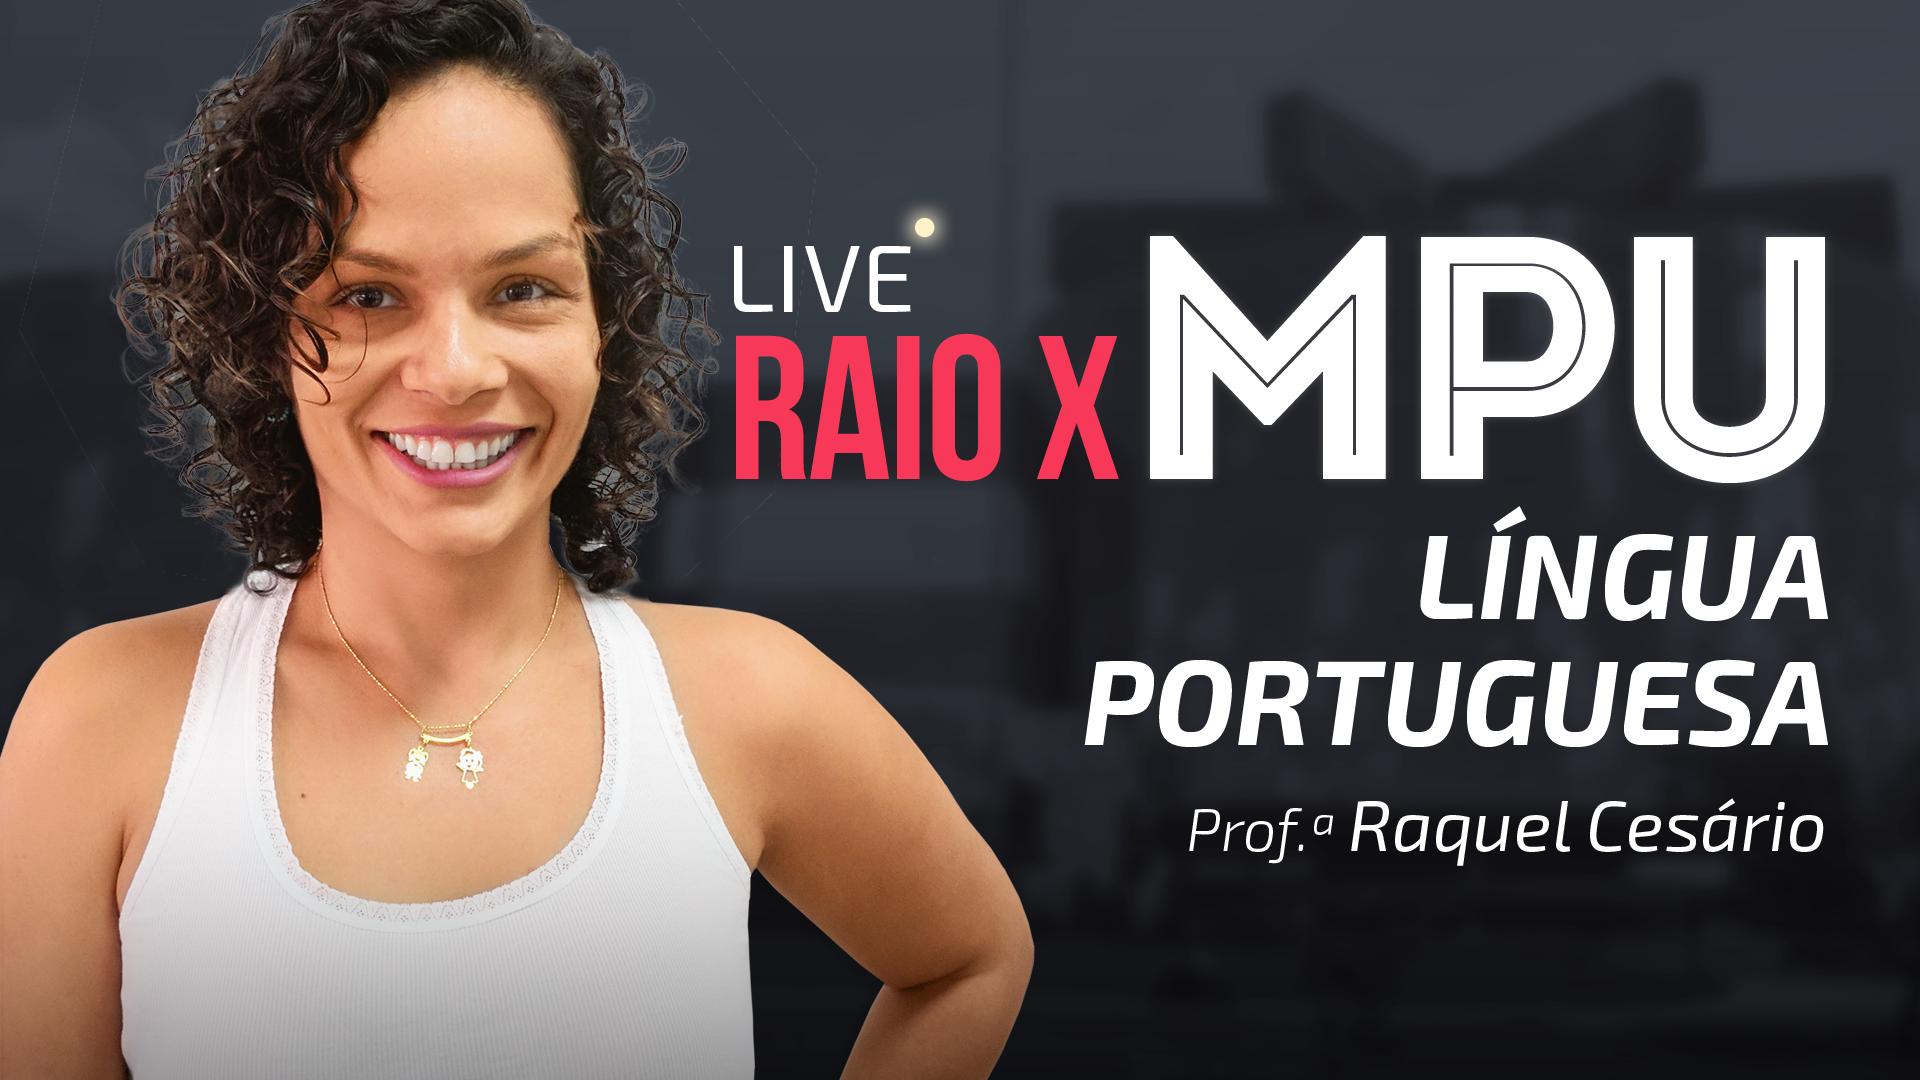 RAIO X MPU - Língua Portuguesa para Técnico e Analista